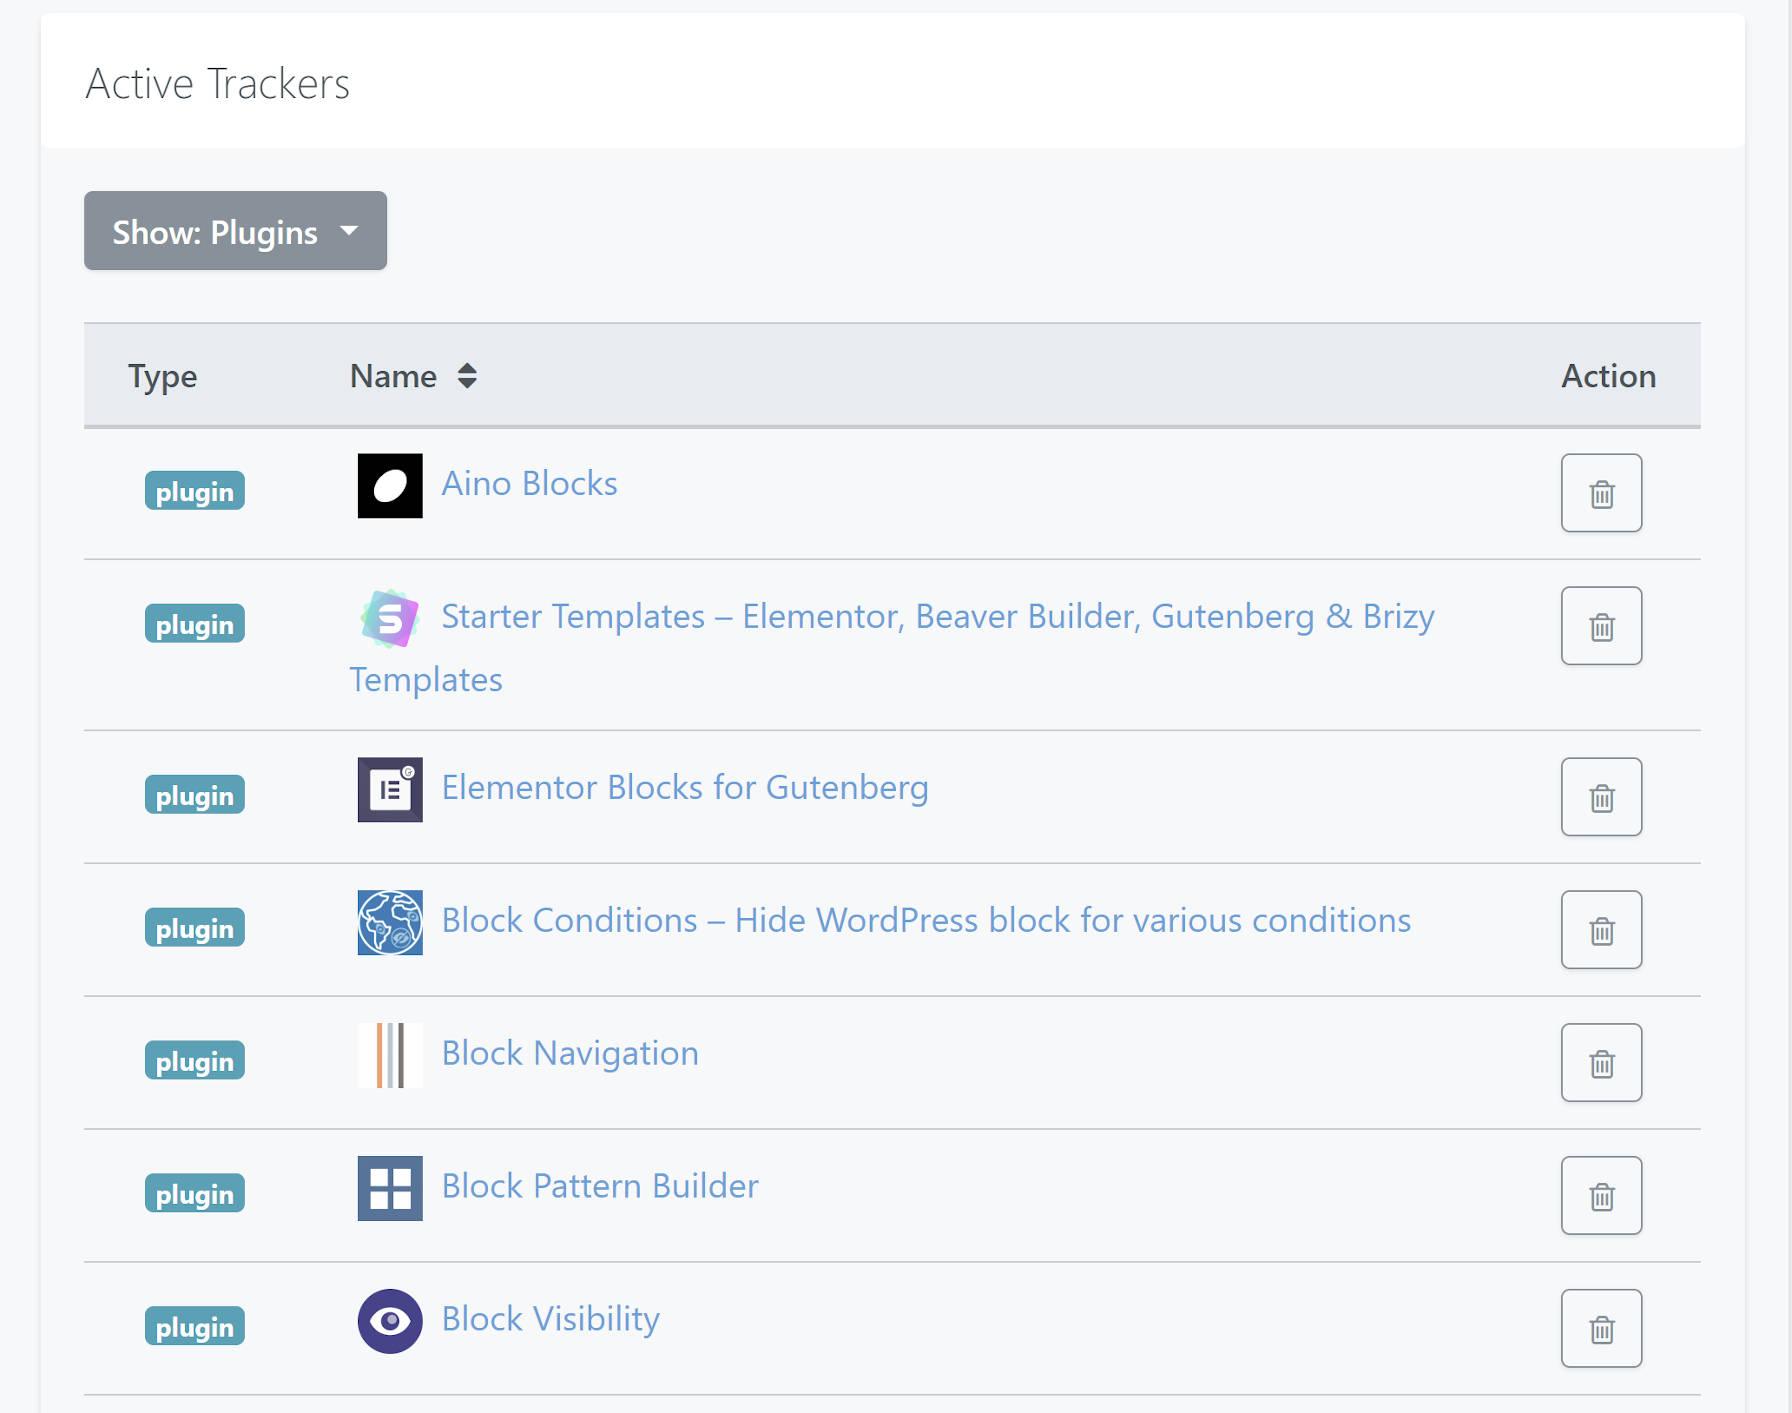 wp-lookout-let-wordpress-users跟蹤並接收其首選插件和主題-1的通知WP Lookout使WordPress用戶可以跟蹤和接收其首選插件和主題的通知